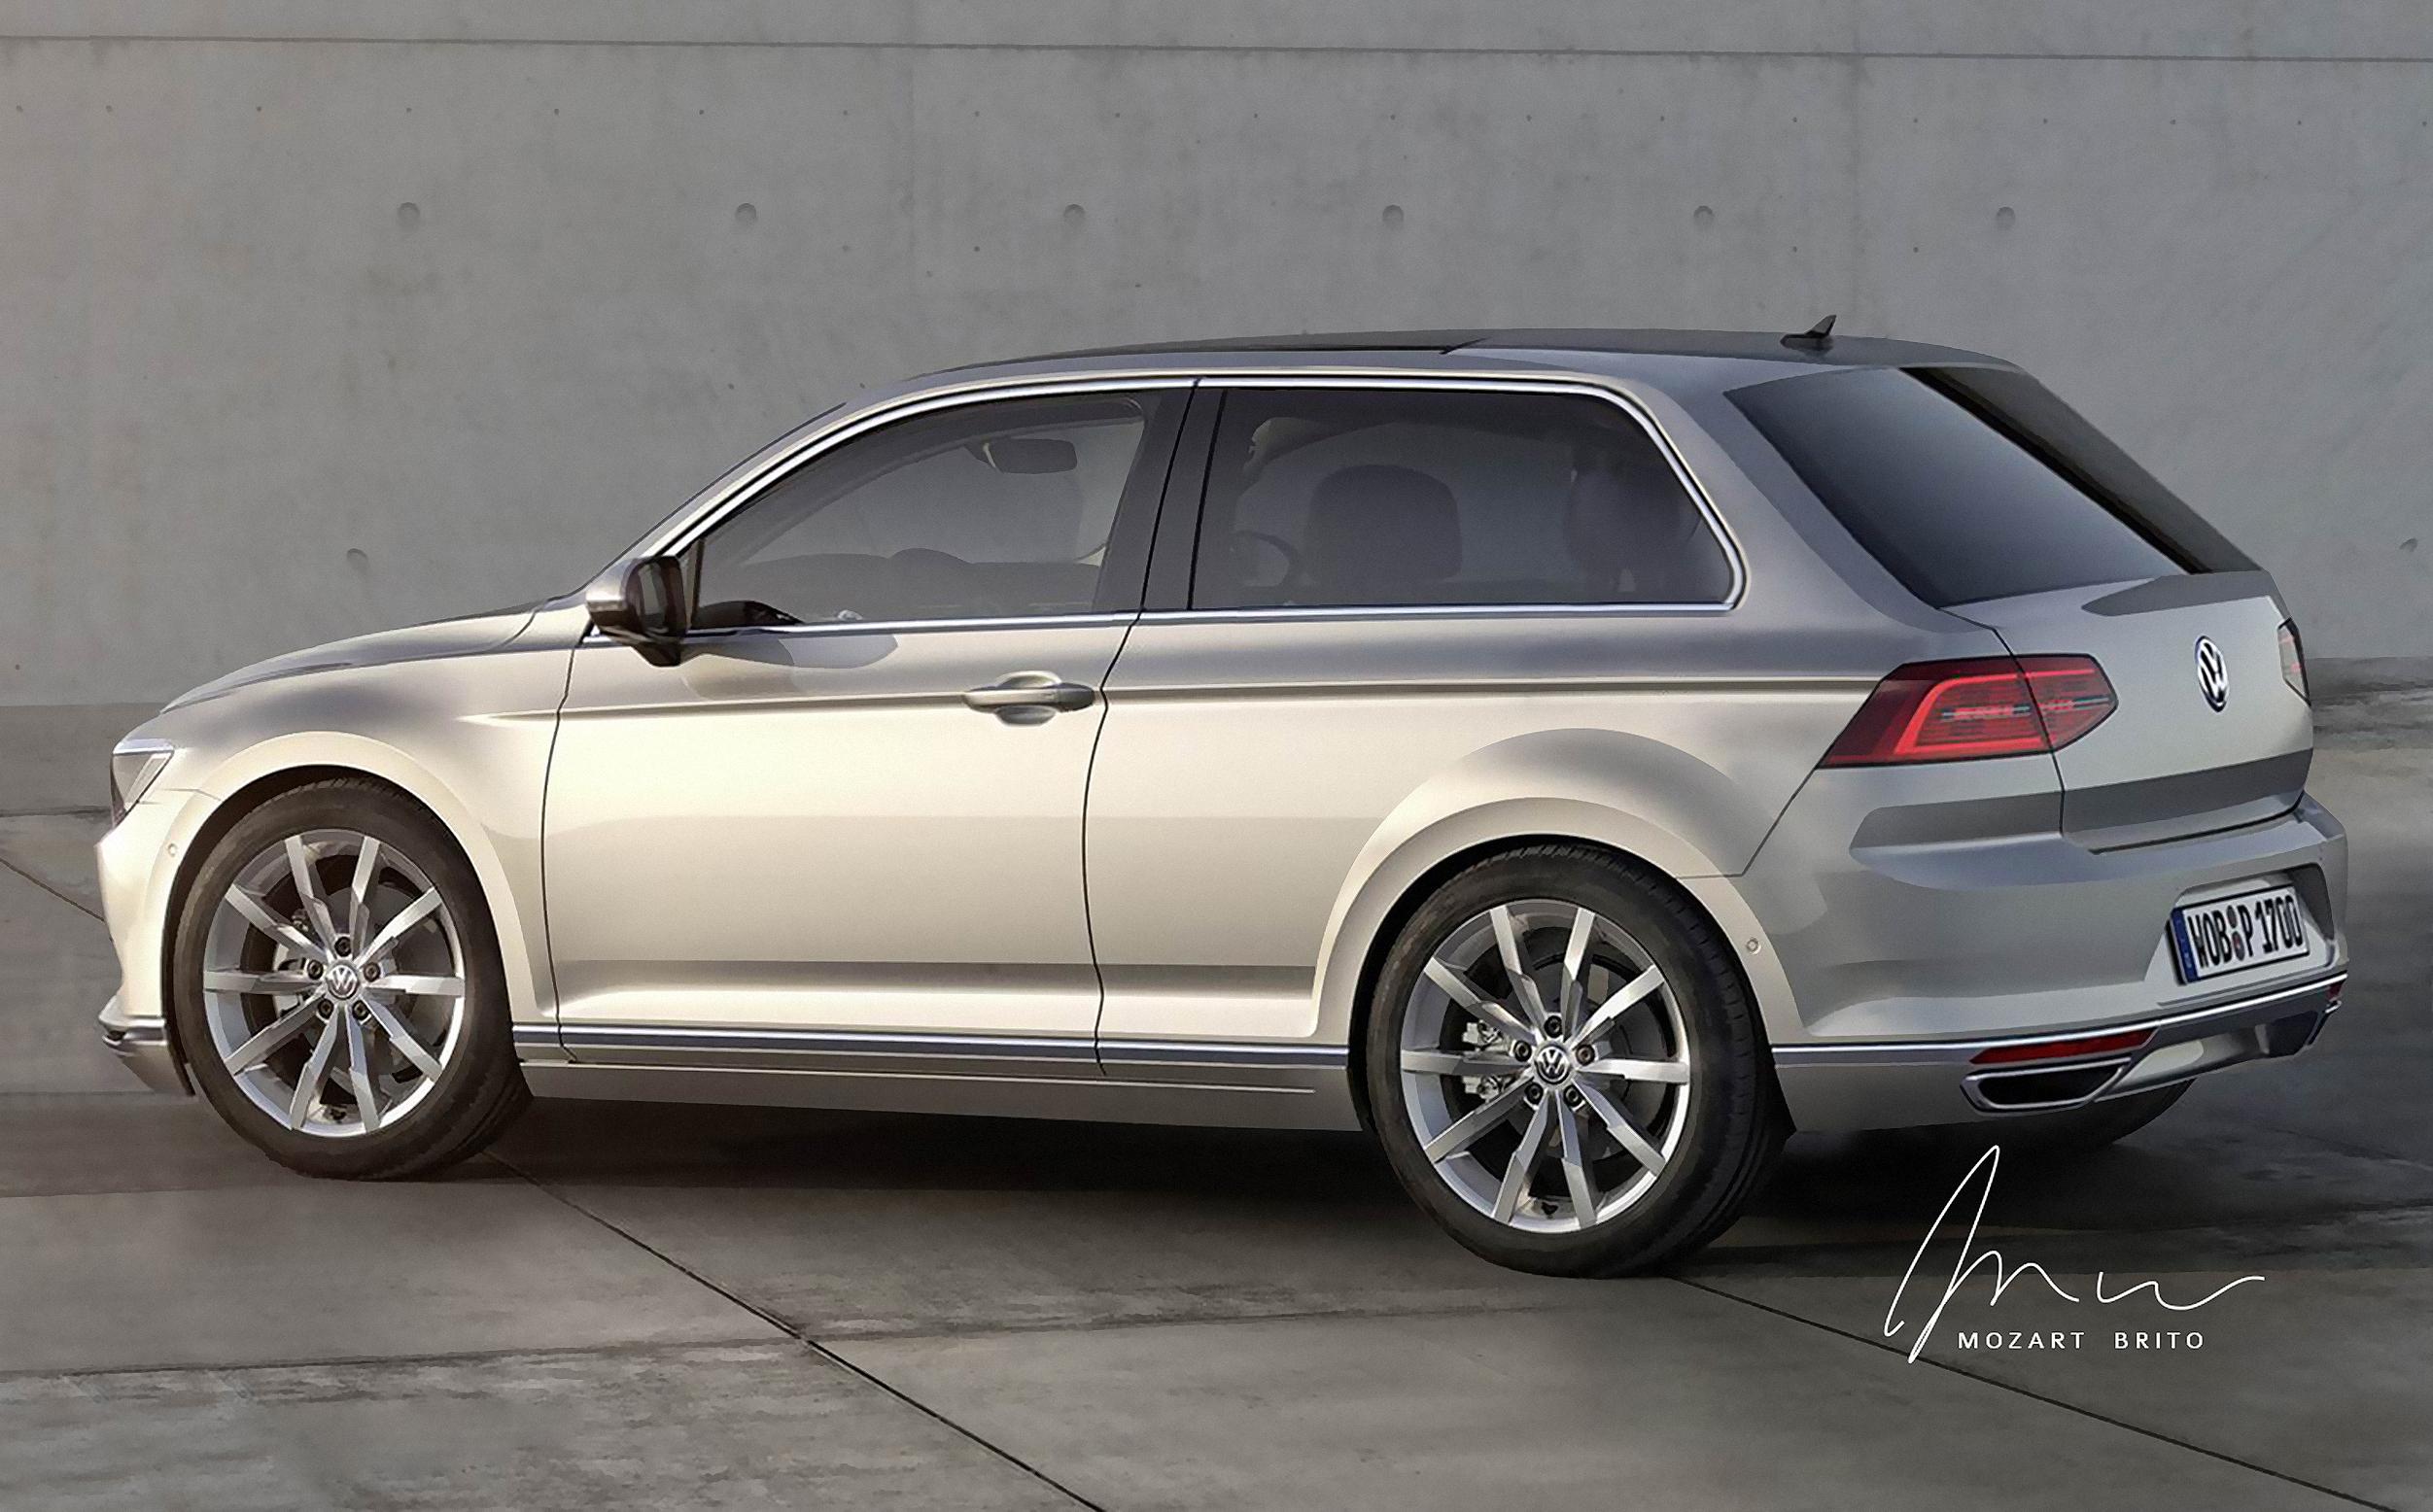 VW Brasilia 2 - Mozart Brito